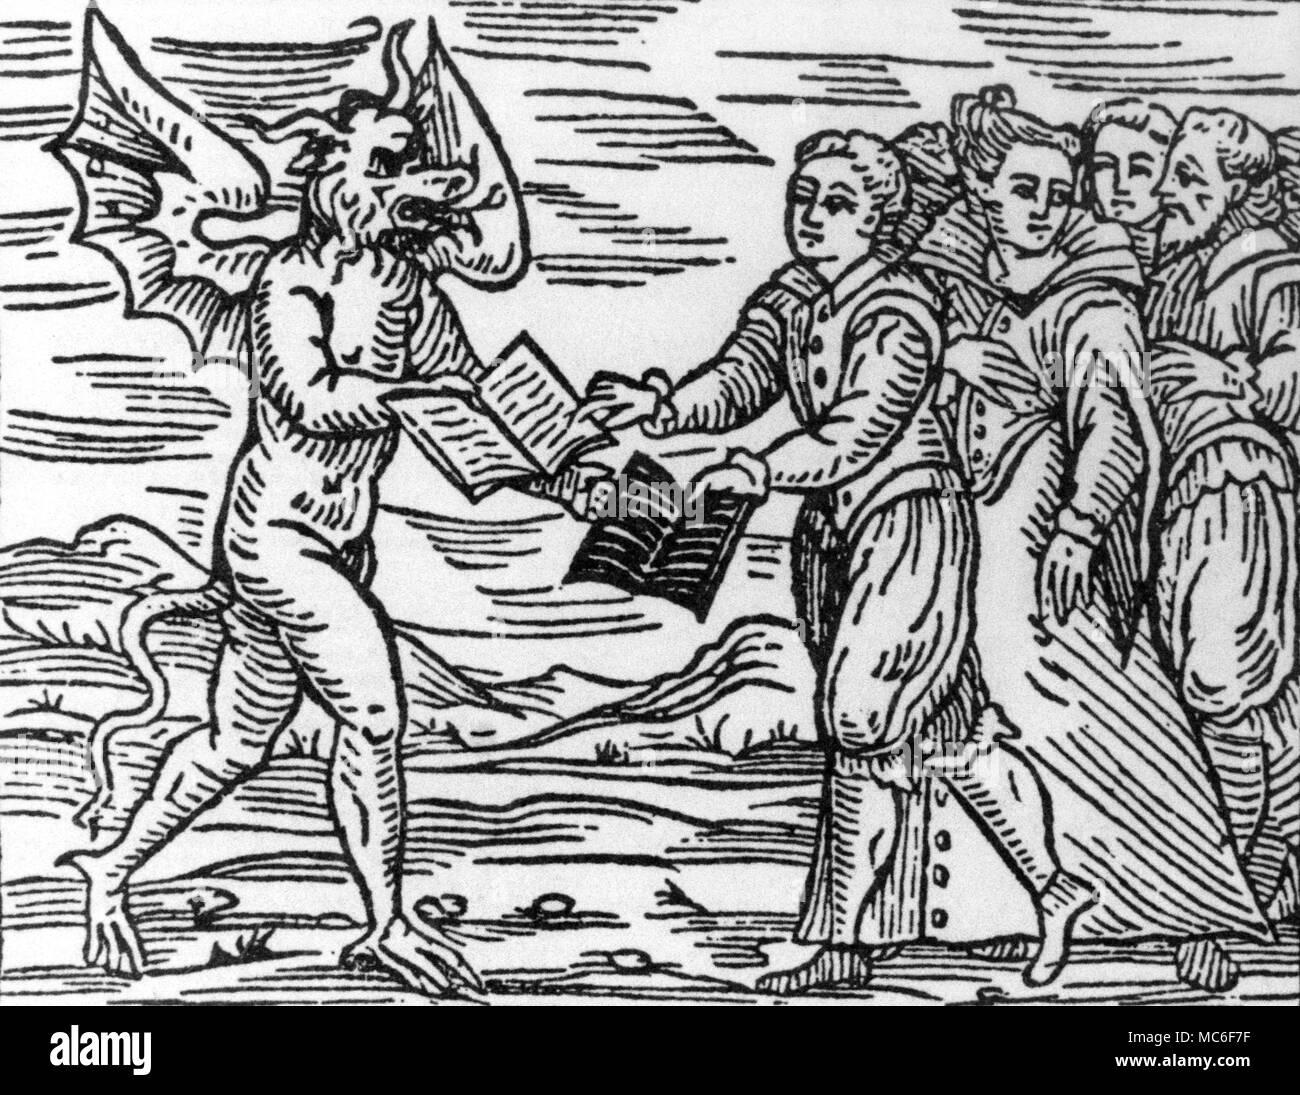 devil in the white city ebook pdf